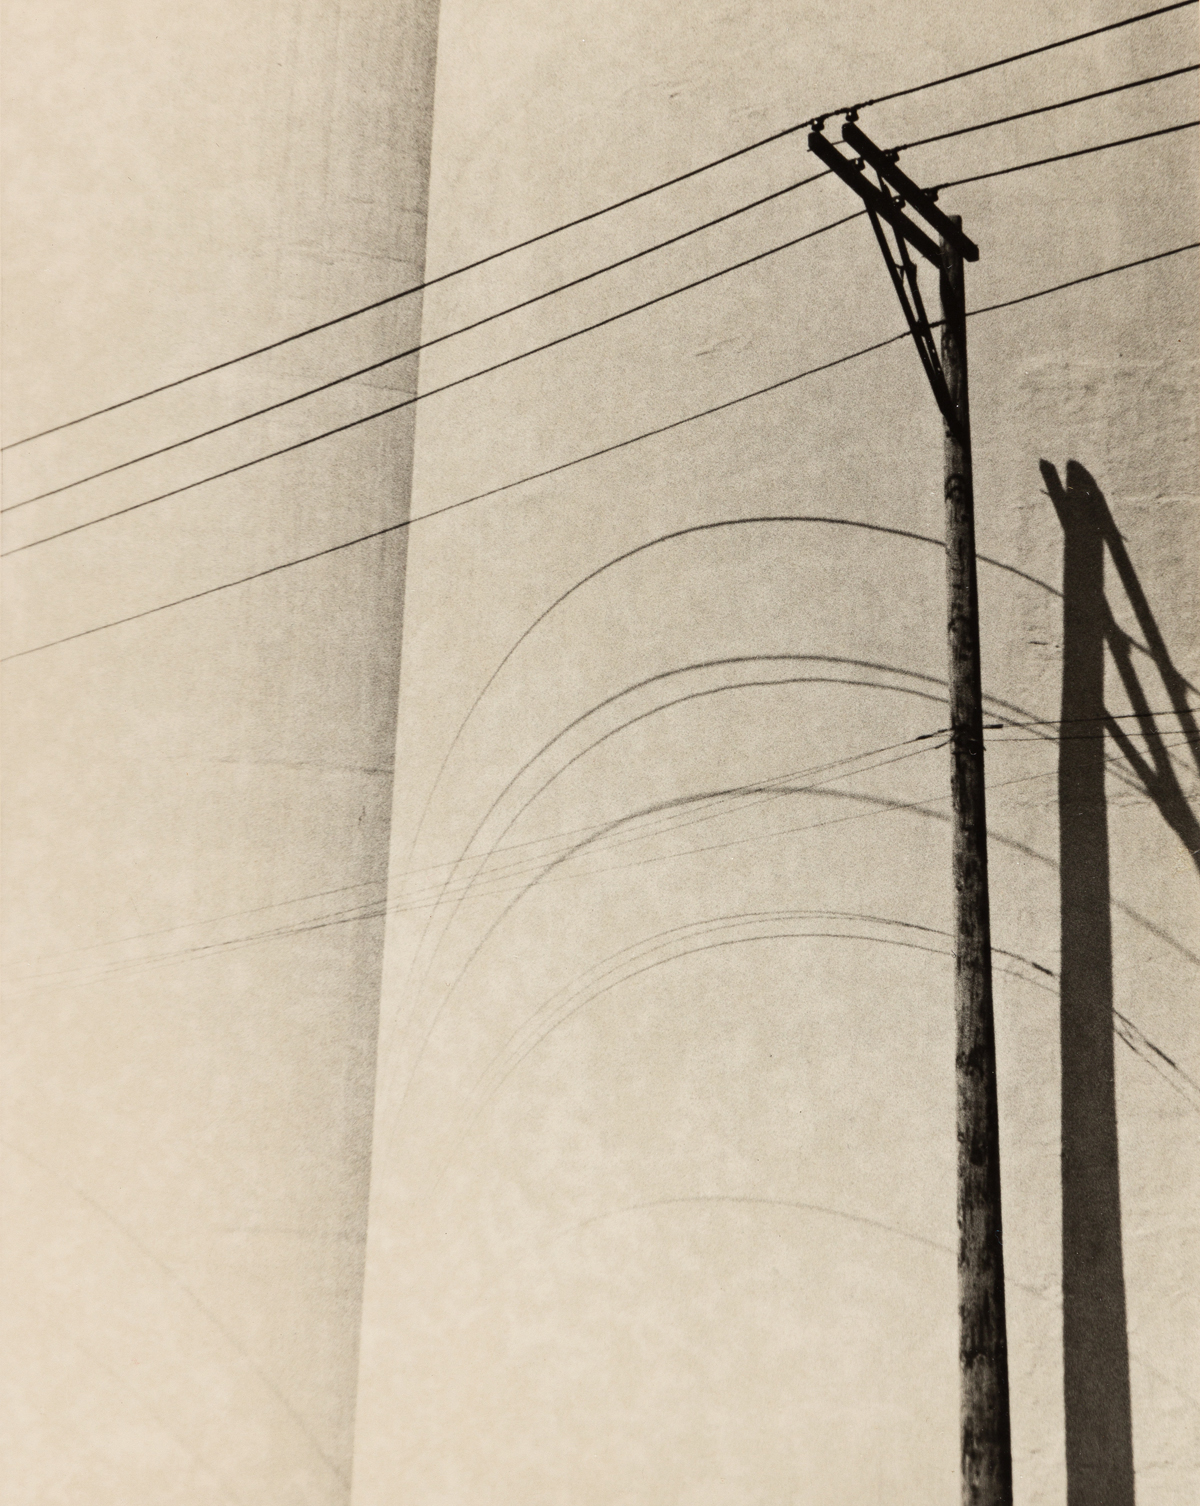 RALSTON CRAWFORD (1906-1978) Telephone wires.